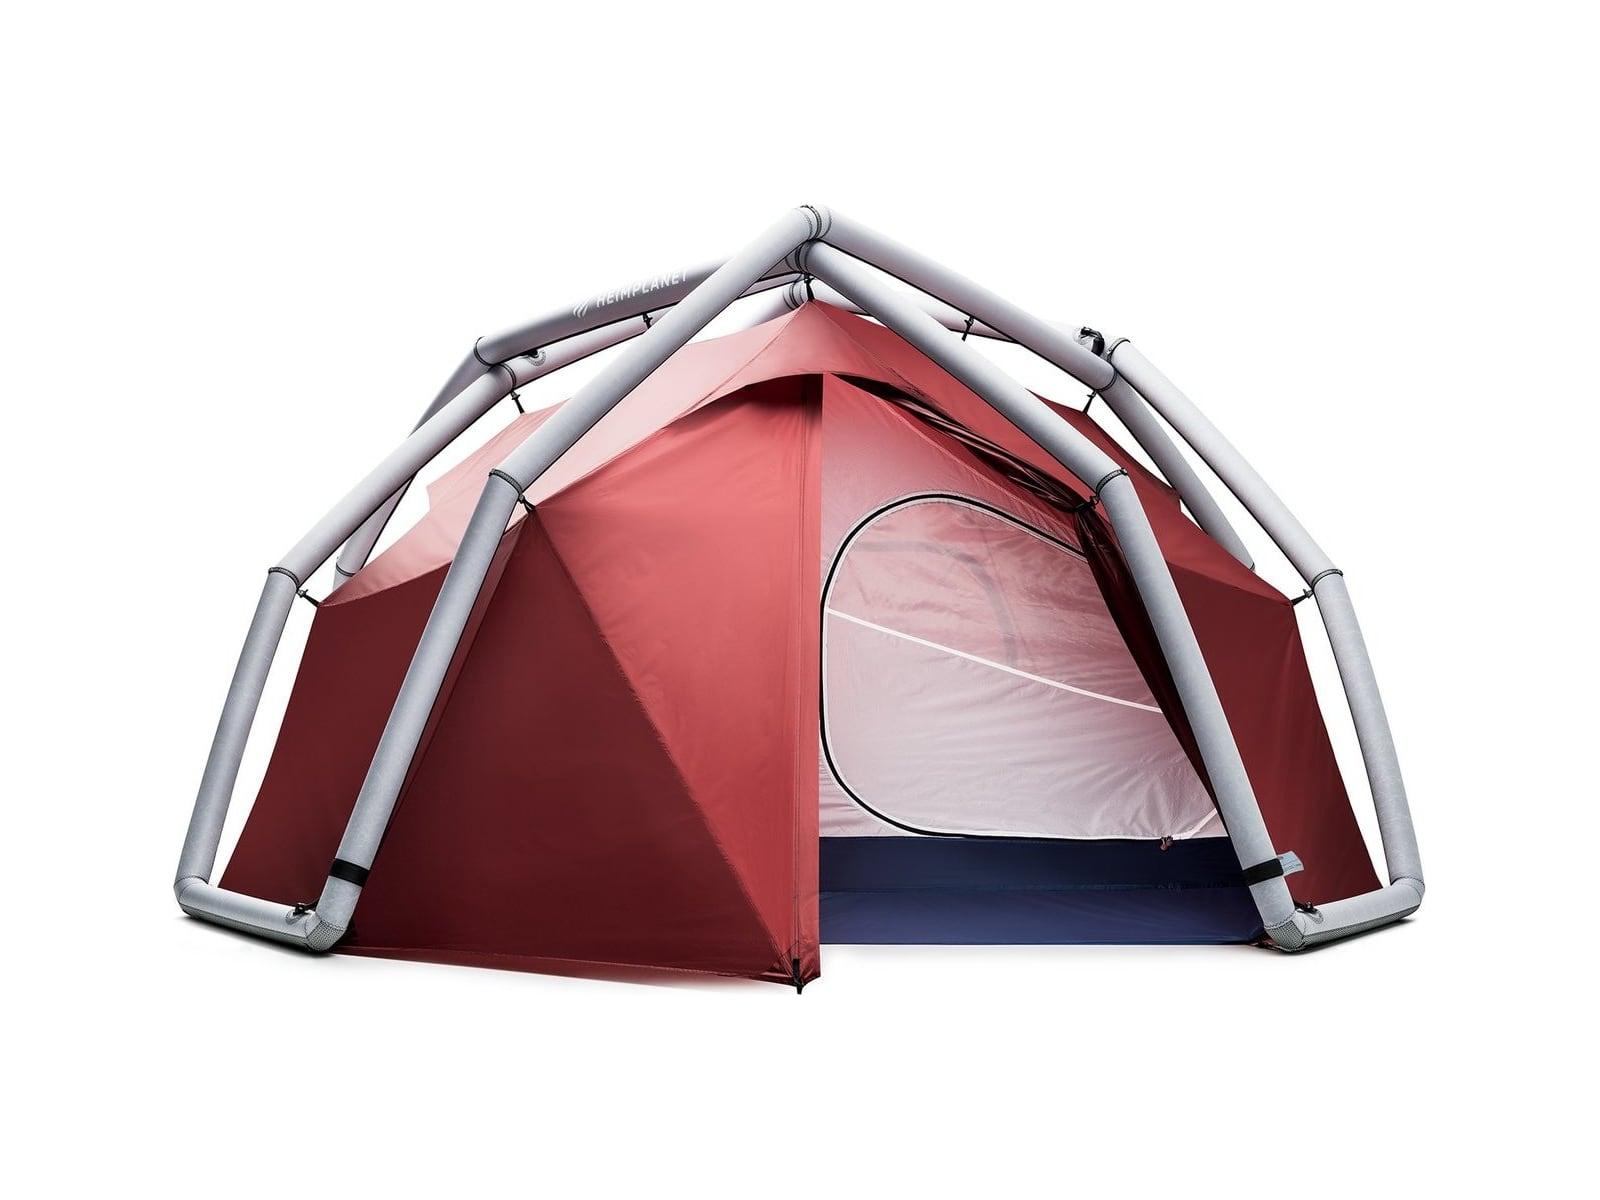 nye skogs Campingplasser med hekte Gratis online mobil dating chat